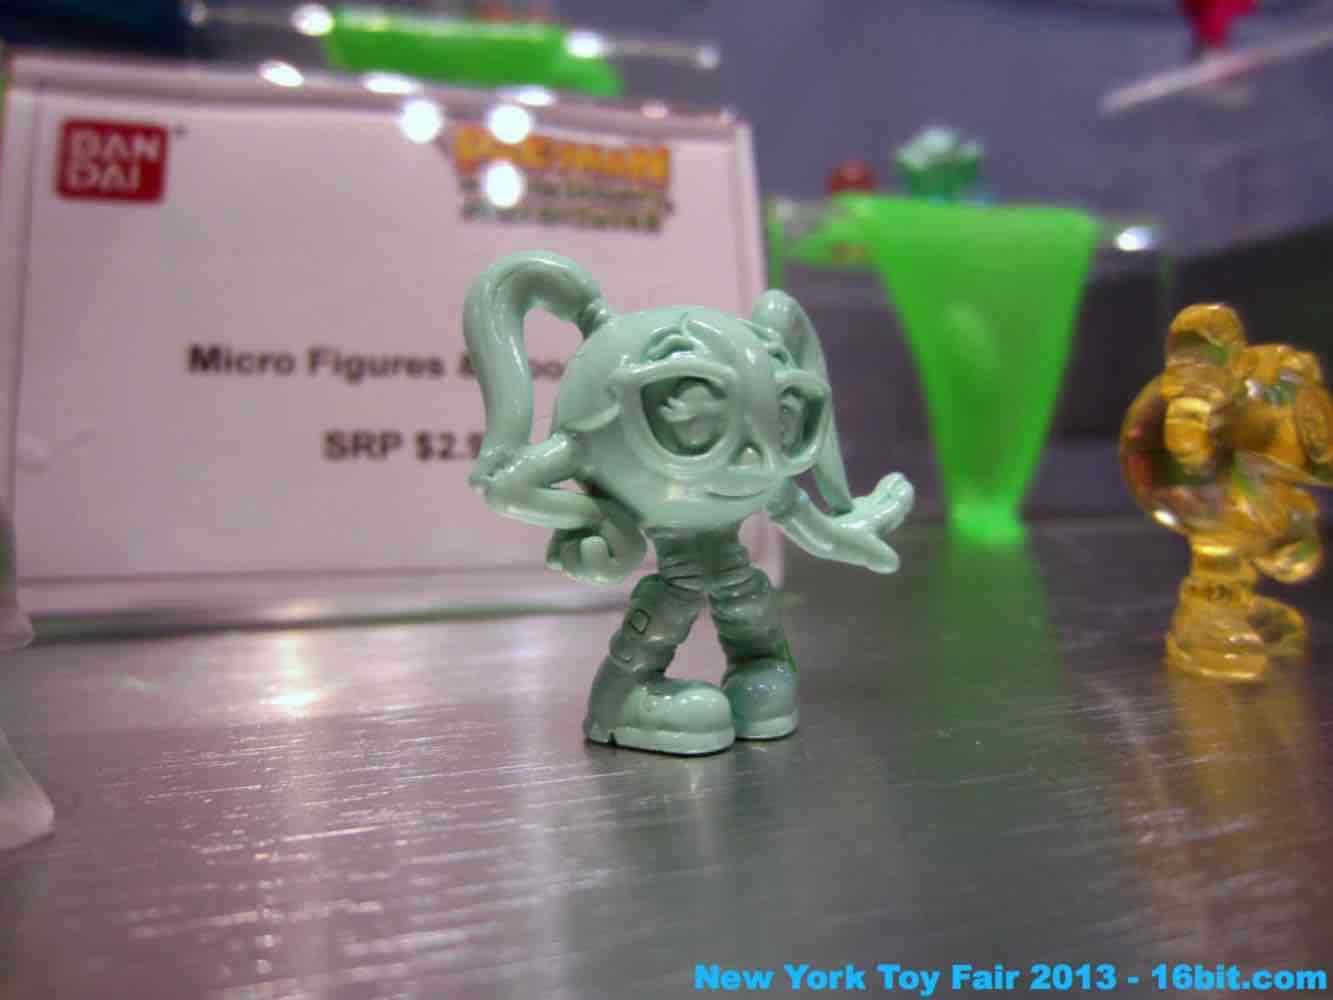 16bitcom Toy Fair Coverage of BanDai PacMan Action